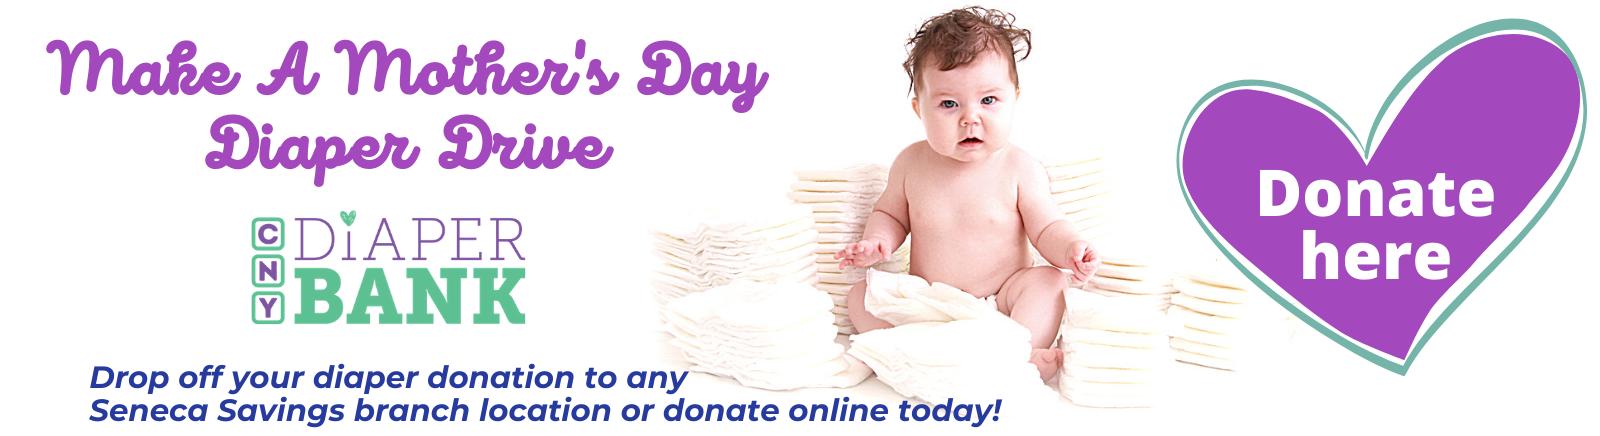 Seneca Savings CNY Diaper Drive Make A Mothers Day diaper drive donation